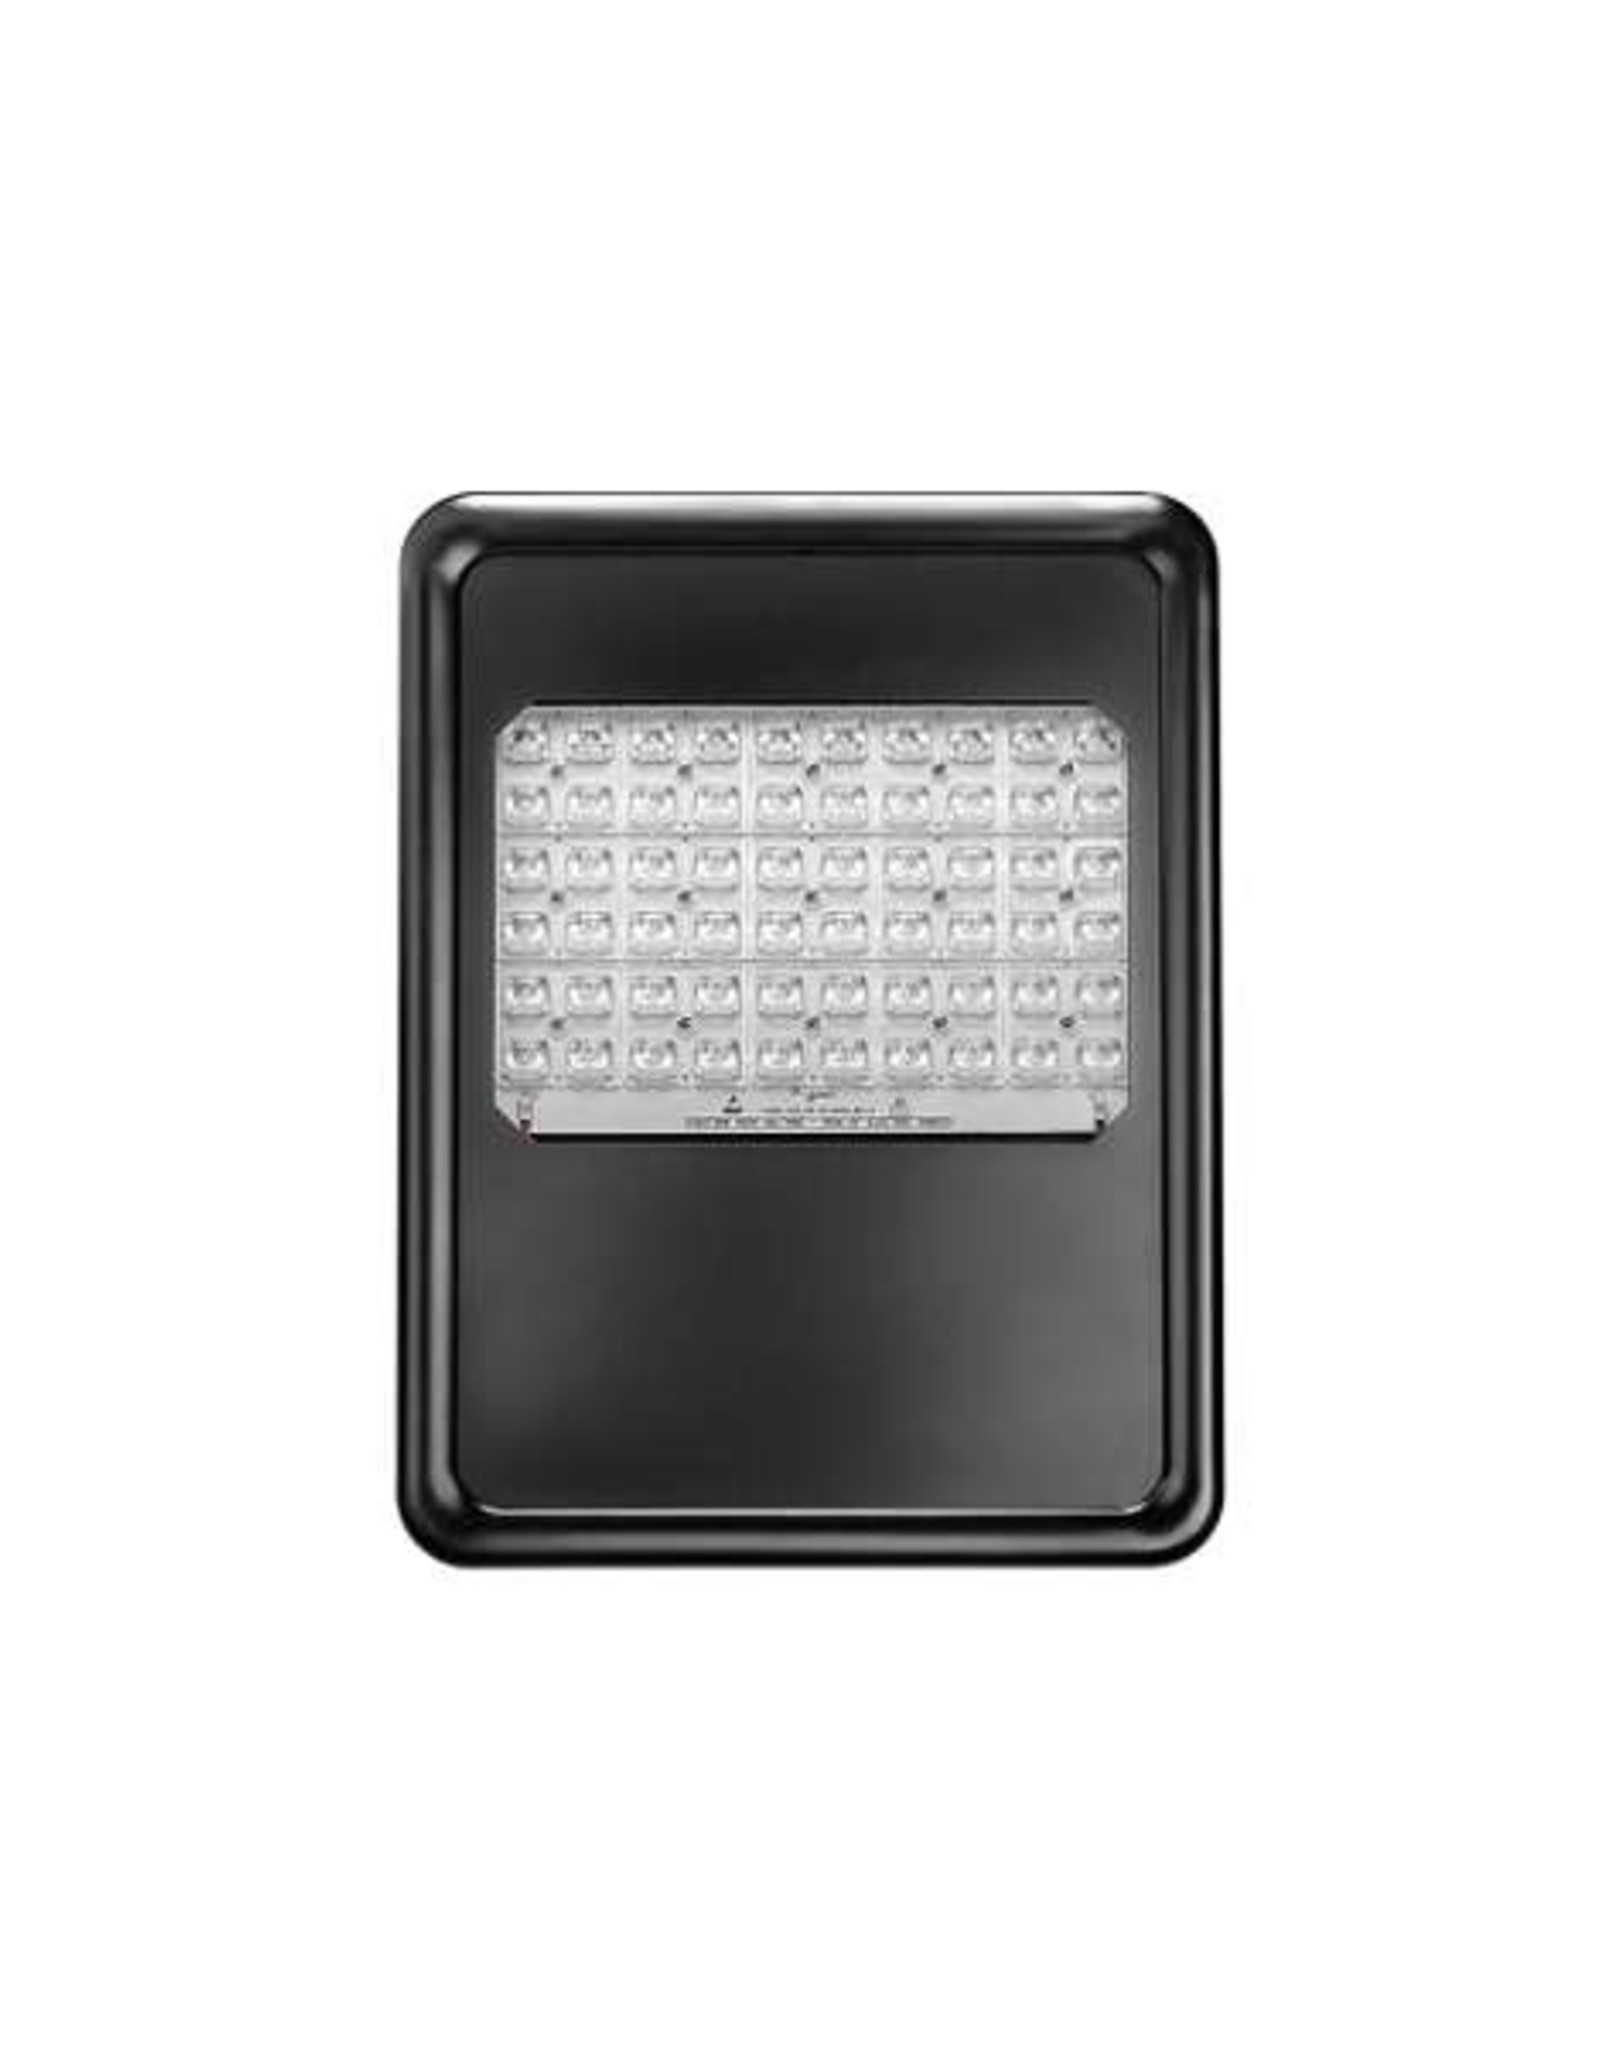 LUXON LED SKYLIGHT:LED 3.0 II